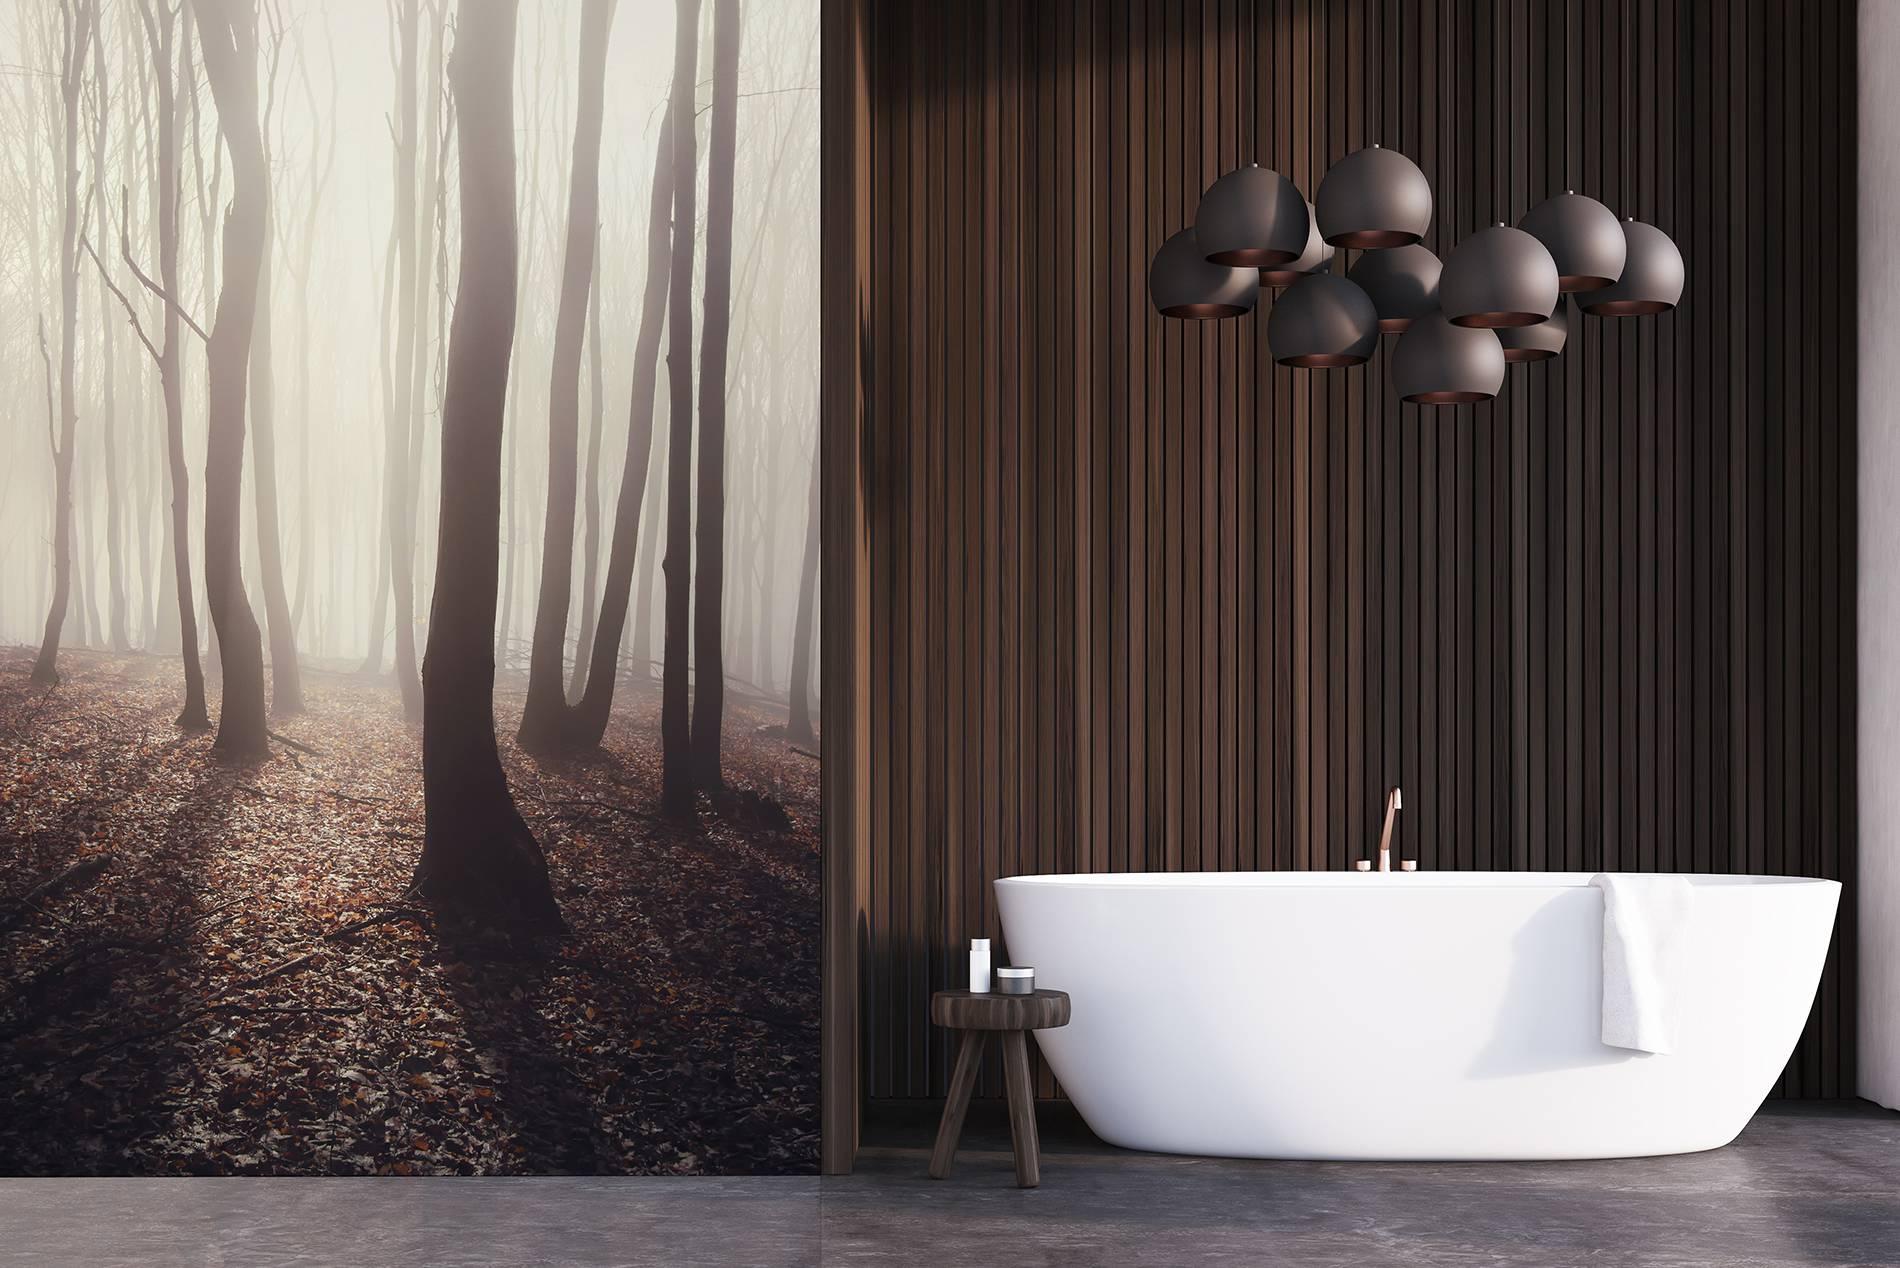 Klassiek bruin • Badkamer - Modern - Fotobehang - Natuur • Pixers ...